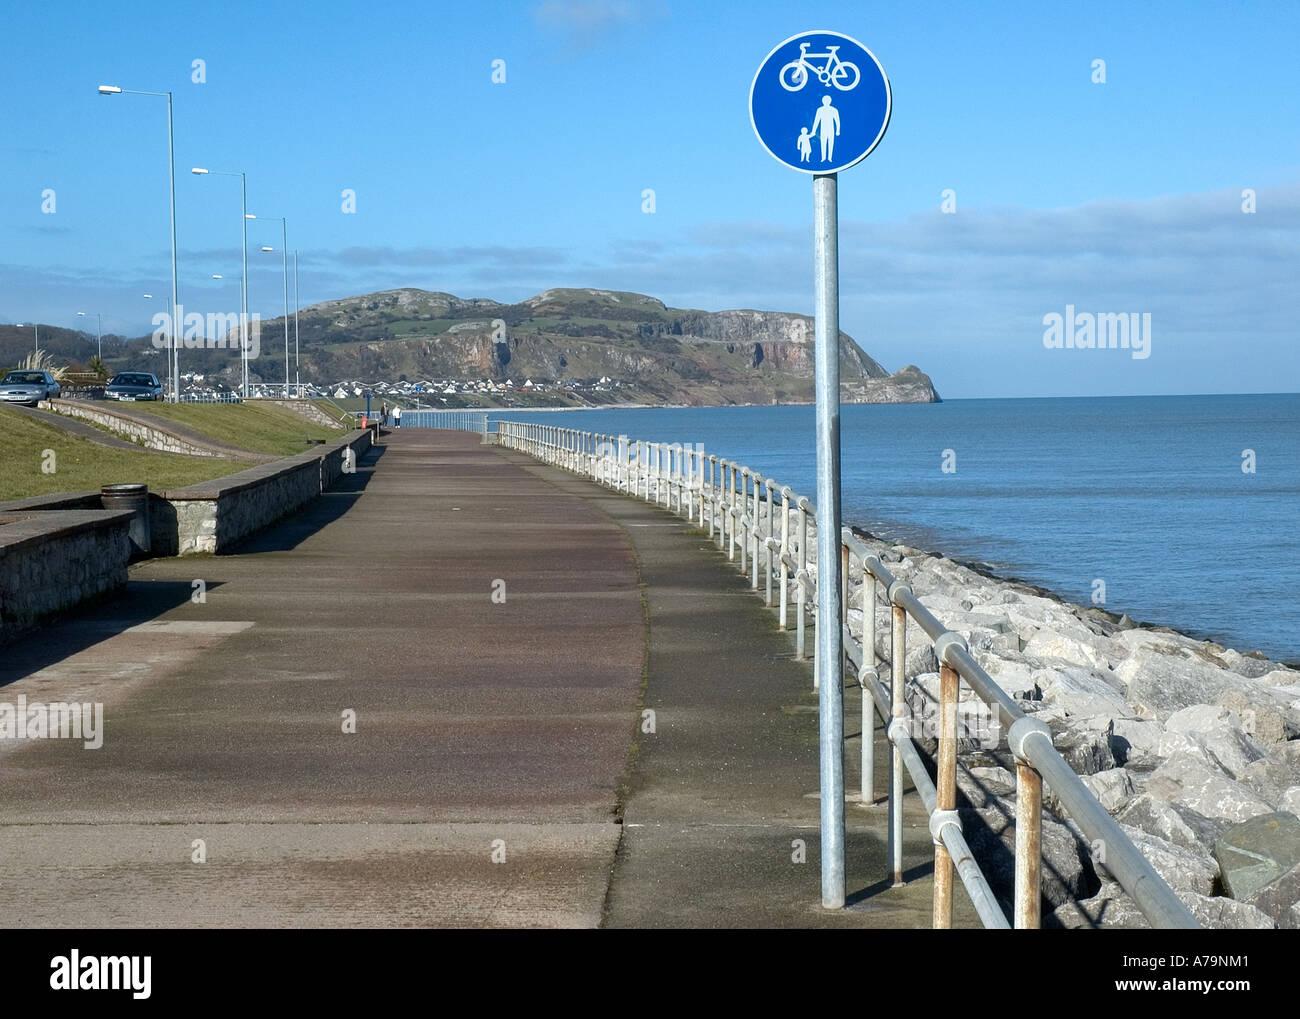 Cycle path,Rhos on sea promenade,Colwyn Bay,North Wales - Stock Image